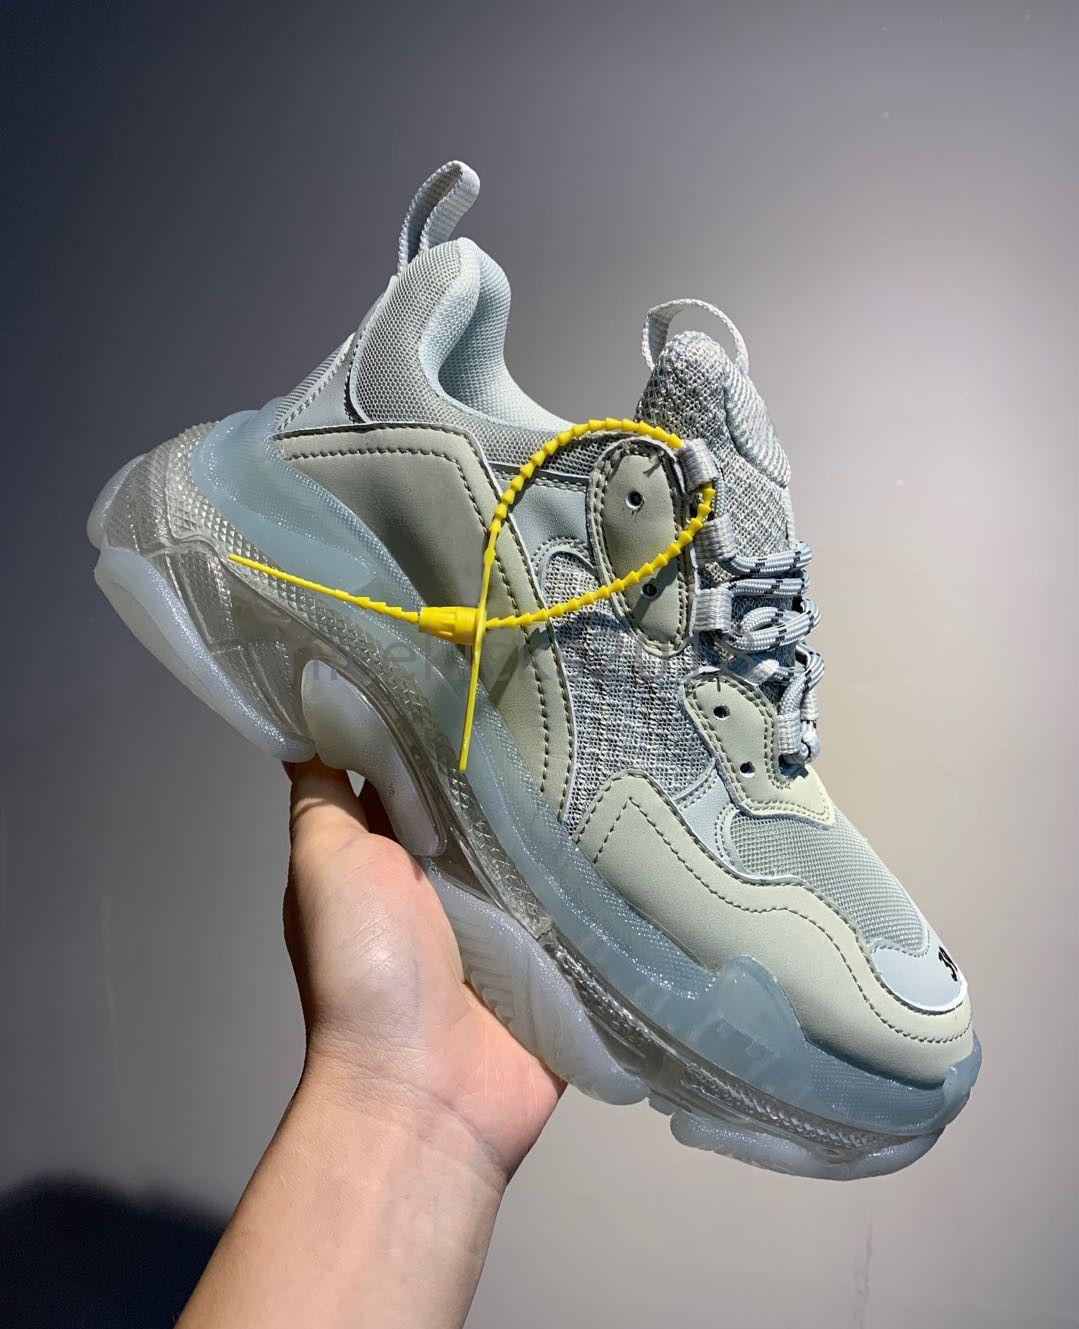 Personality Paris Crystal Bottom Triple-S Casual Shoes Dad Shoe Platform Triple S Sneakers for Men Women Lace Up Dust Bag Tennis